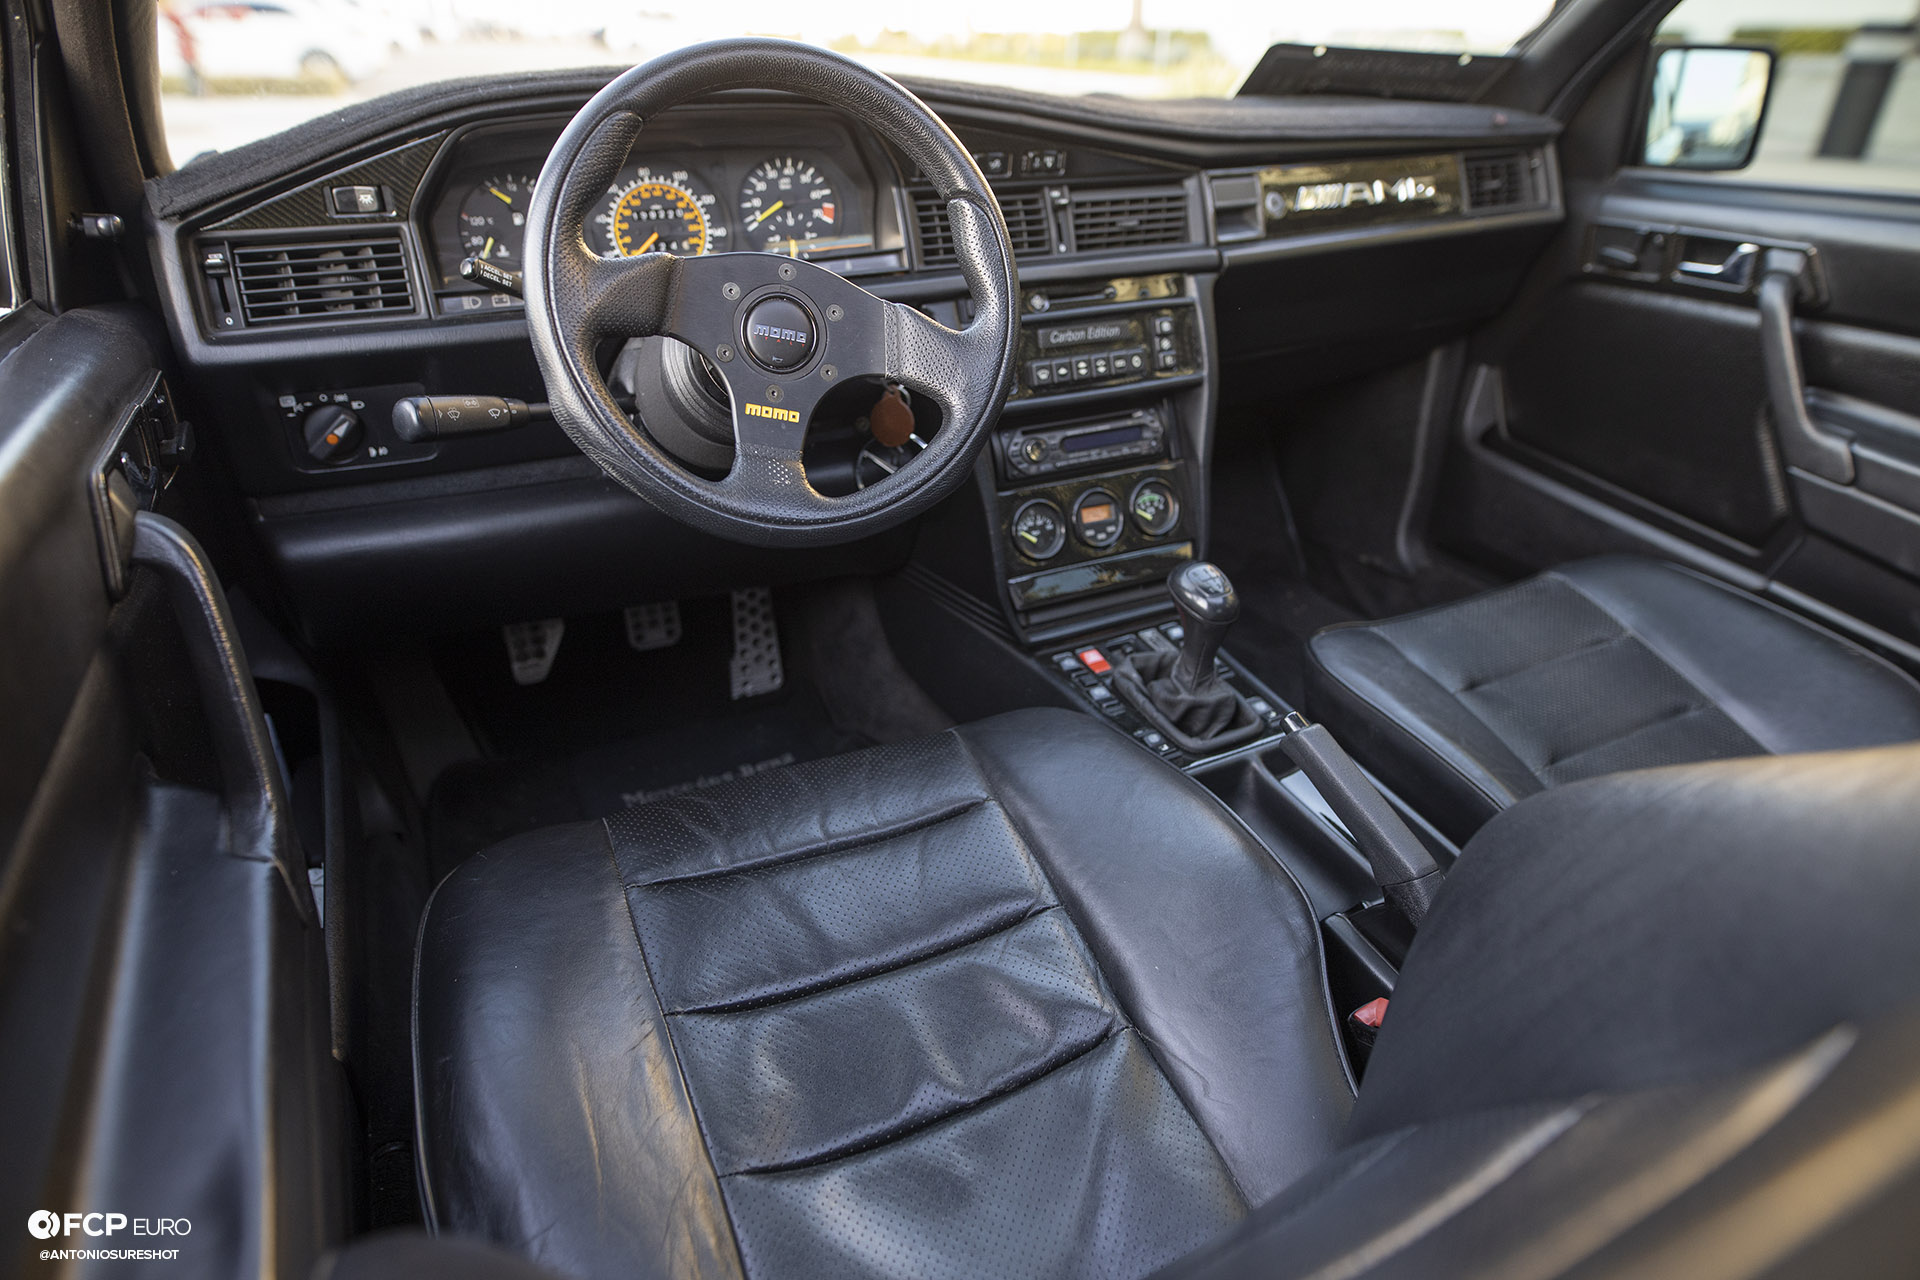 Mercedes Benz 190E 2.3 16v Cosworth EOSR1521